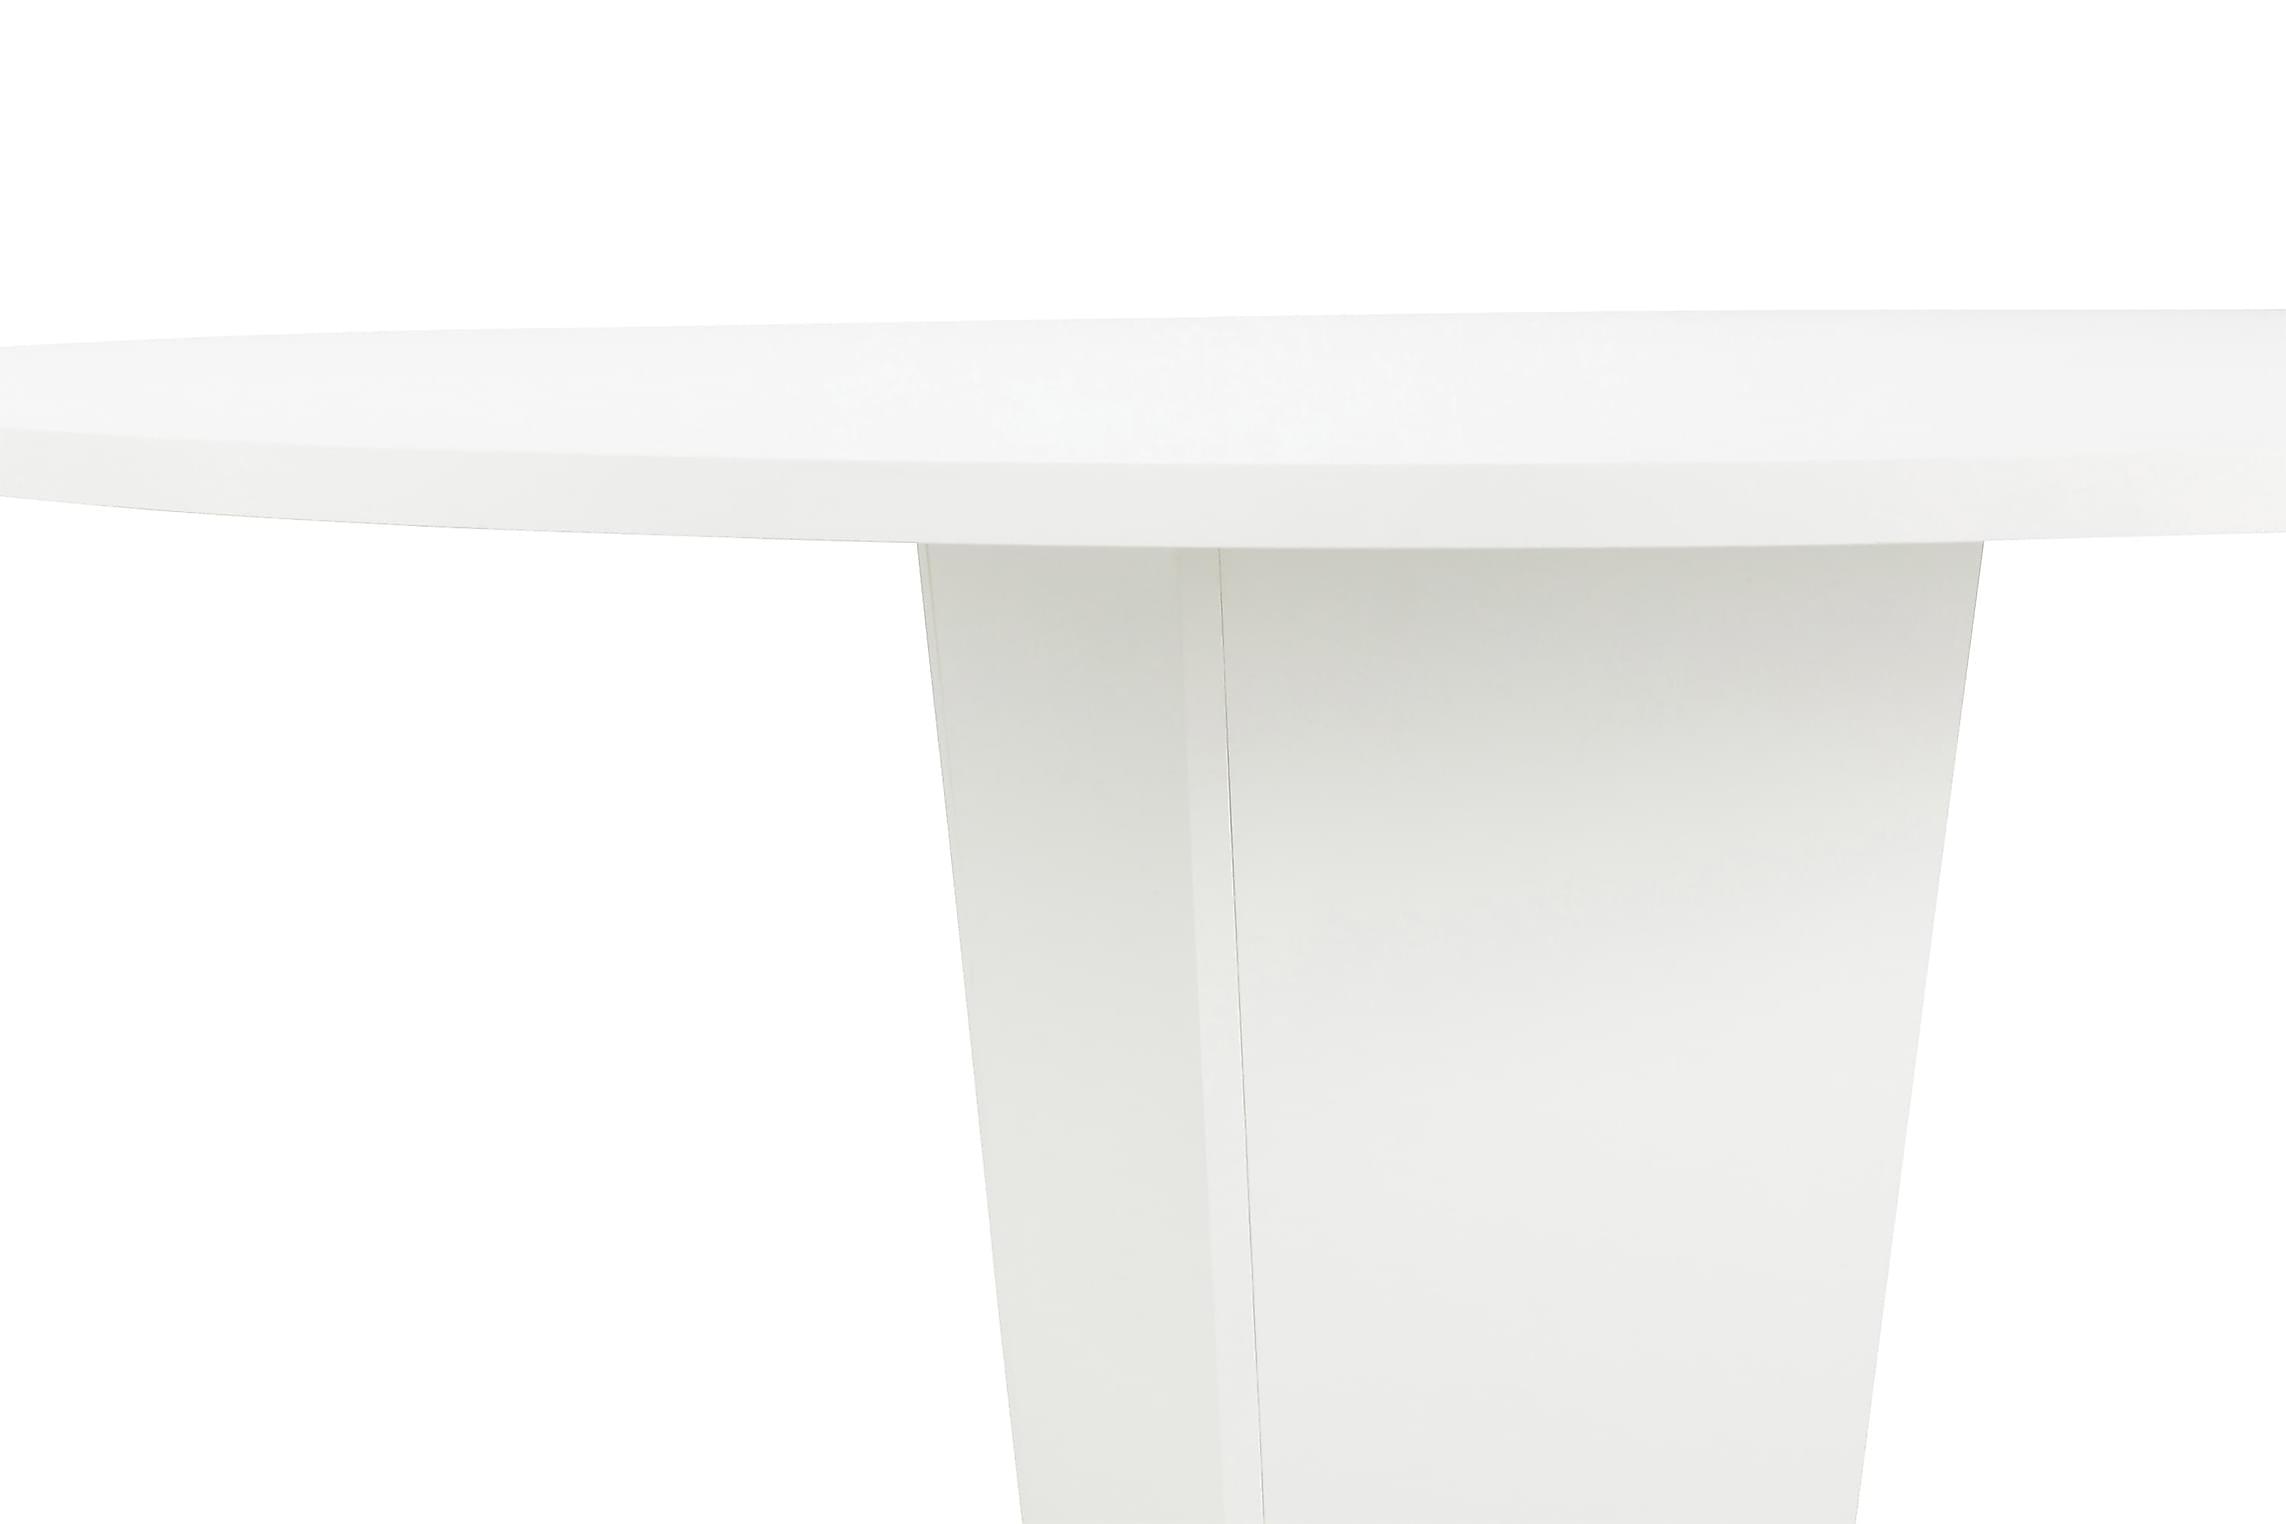 Splitter nya Litet Vxthus Rusta. Vxthus Inspiration Elegant Vxthus Mur Maxi ZI-02